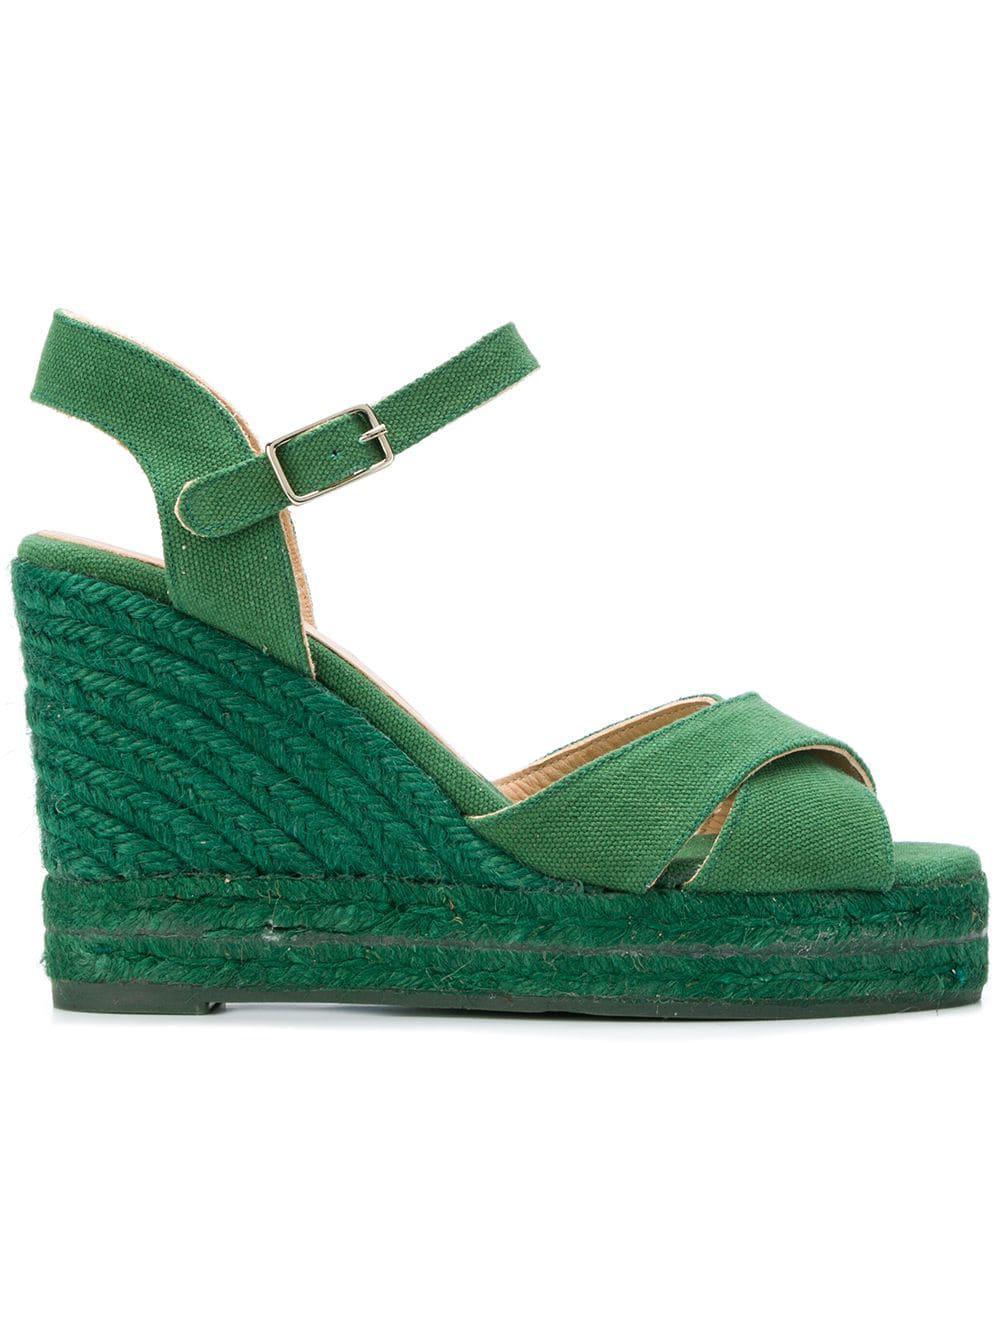 591c632433a Castaner Espadrille Wedge Sandals in Green - Lyst